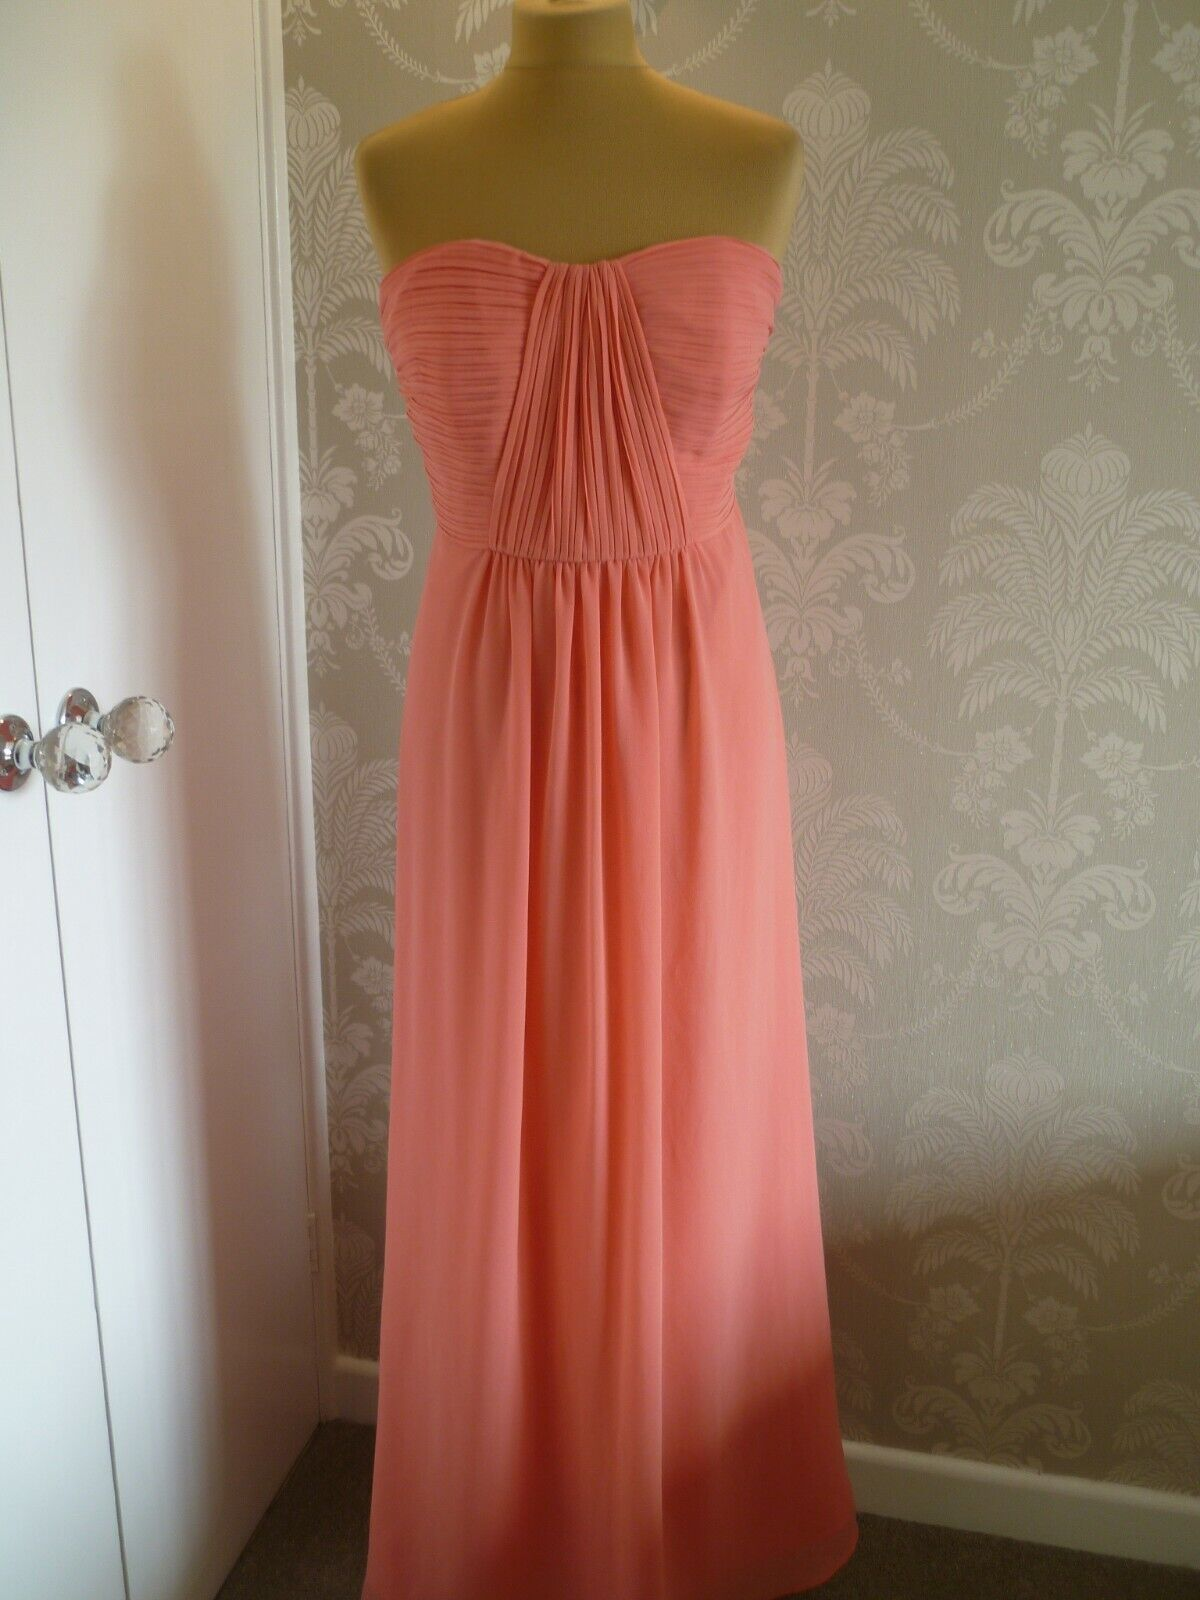 DEBUT (Debenhams) strapless evening dress size 14 - See description